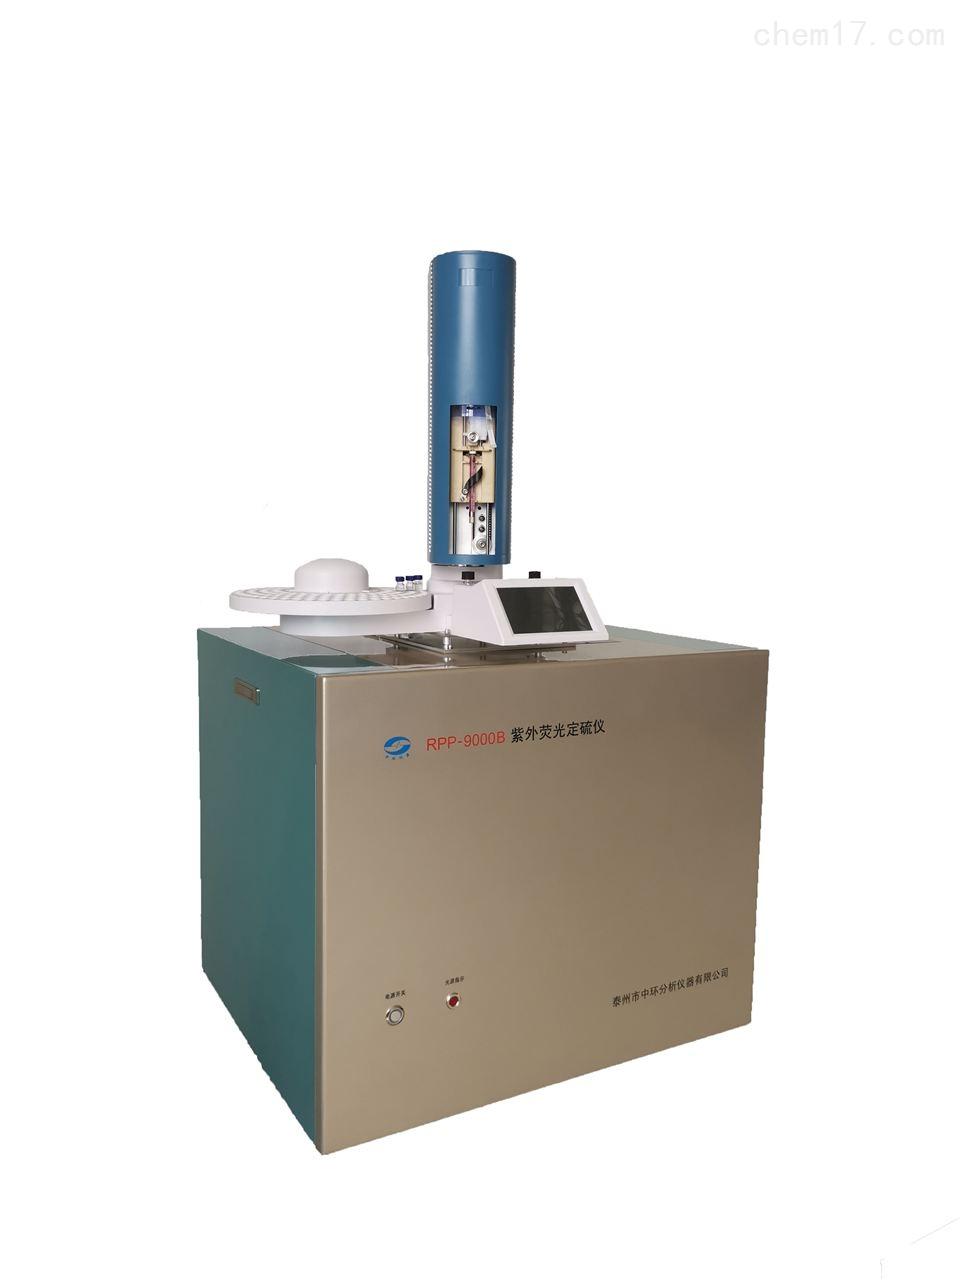 RPP-9000B全自动紫外荧光定硫仪